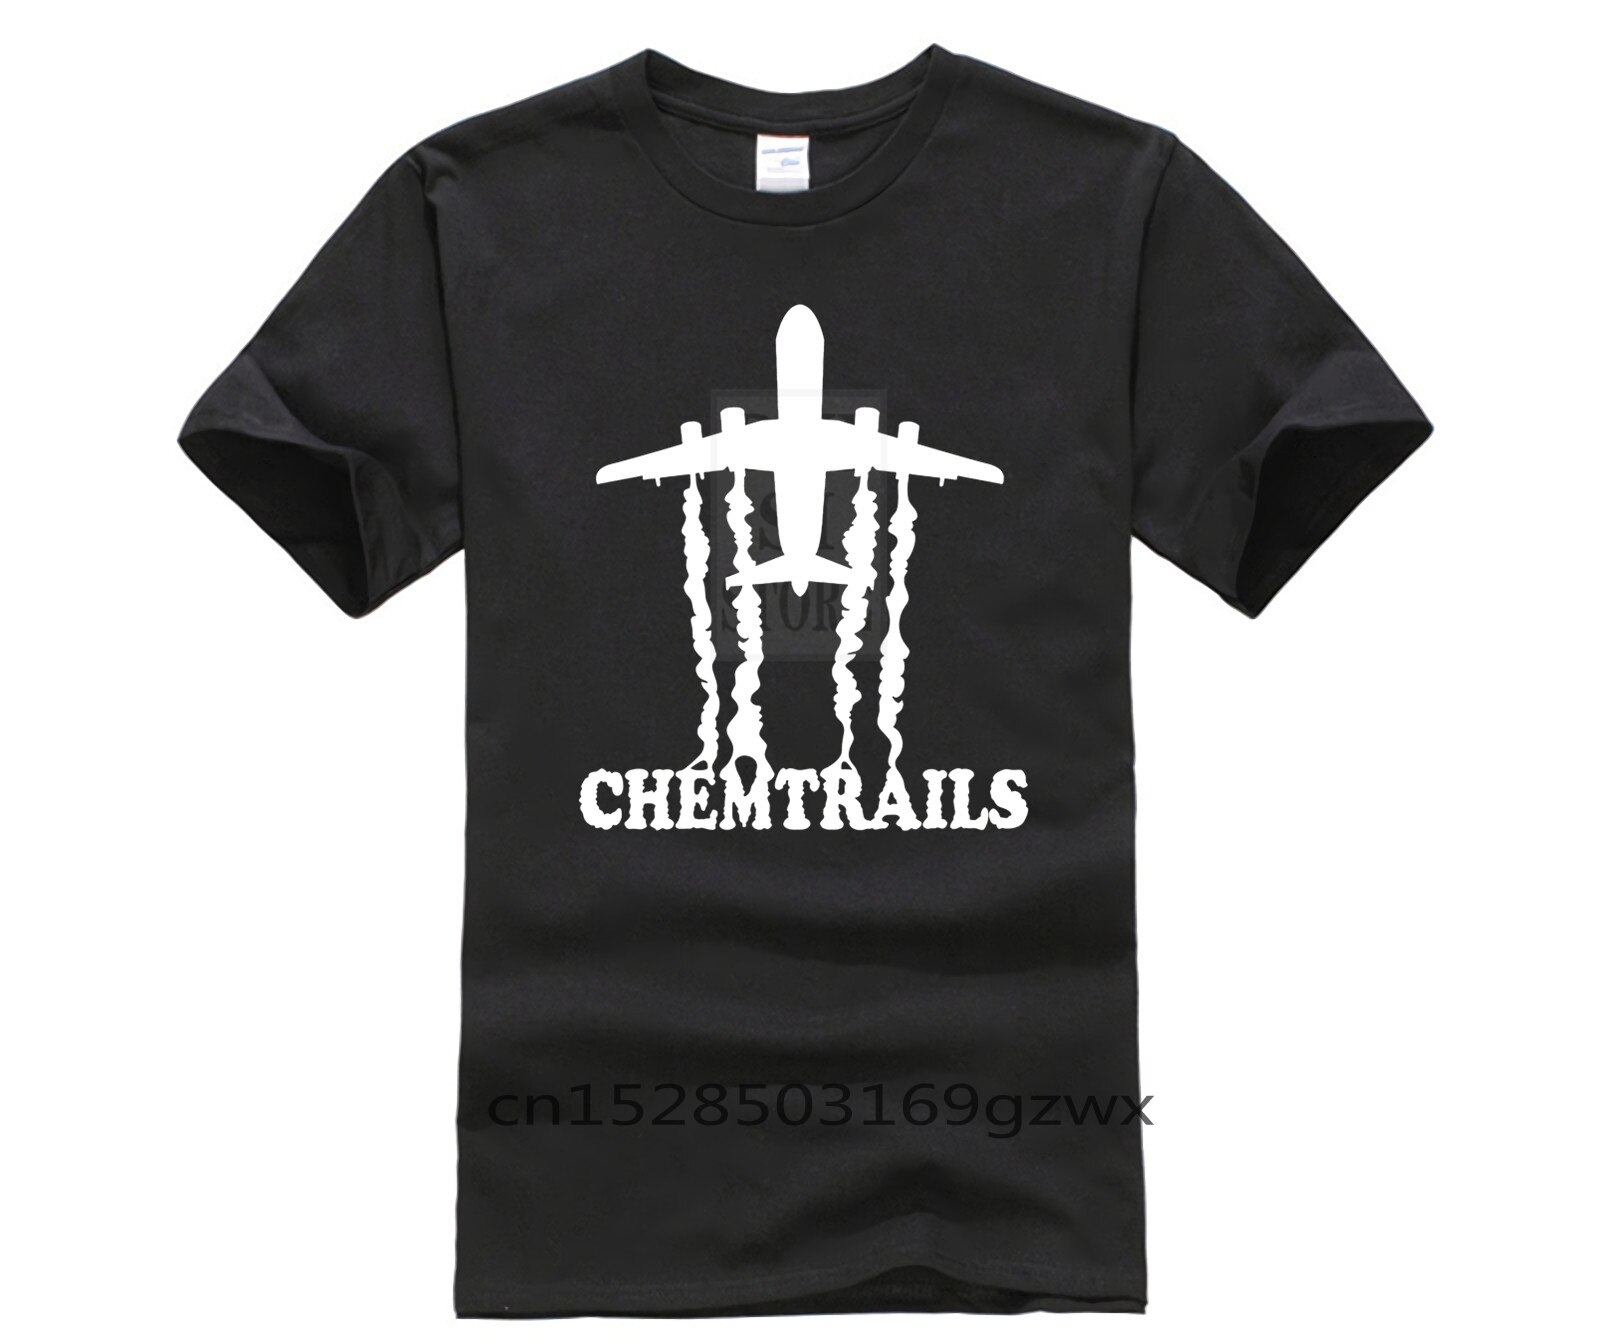 Mans Lustige Hop T-shirt Kurzarm Camisa Kaufen Chemtrails Flugzeug Aktivist Verschwörung Theorie mode T hemd männer